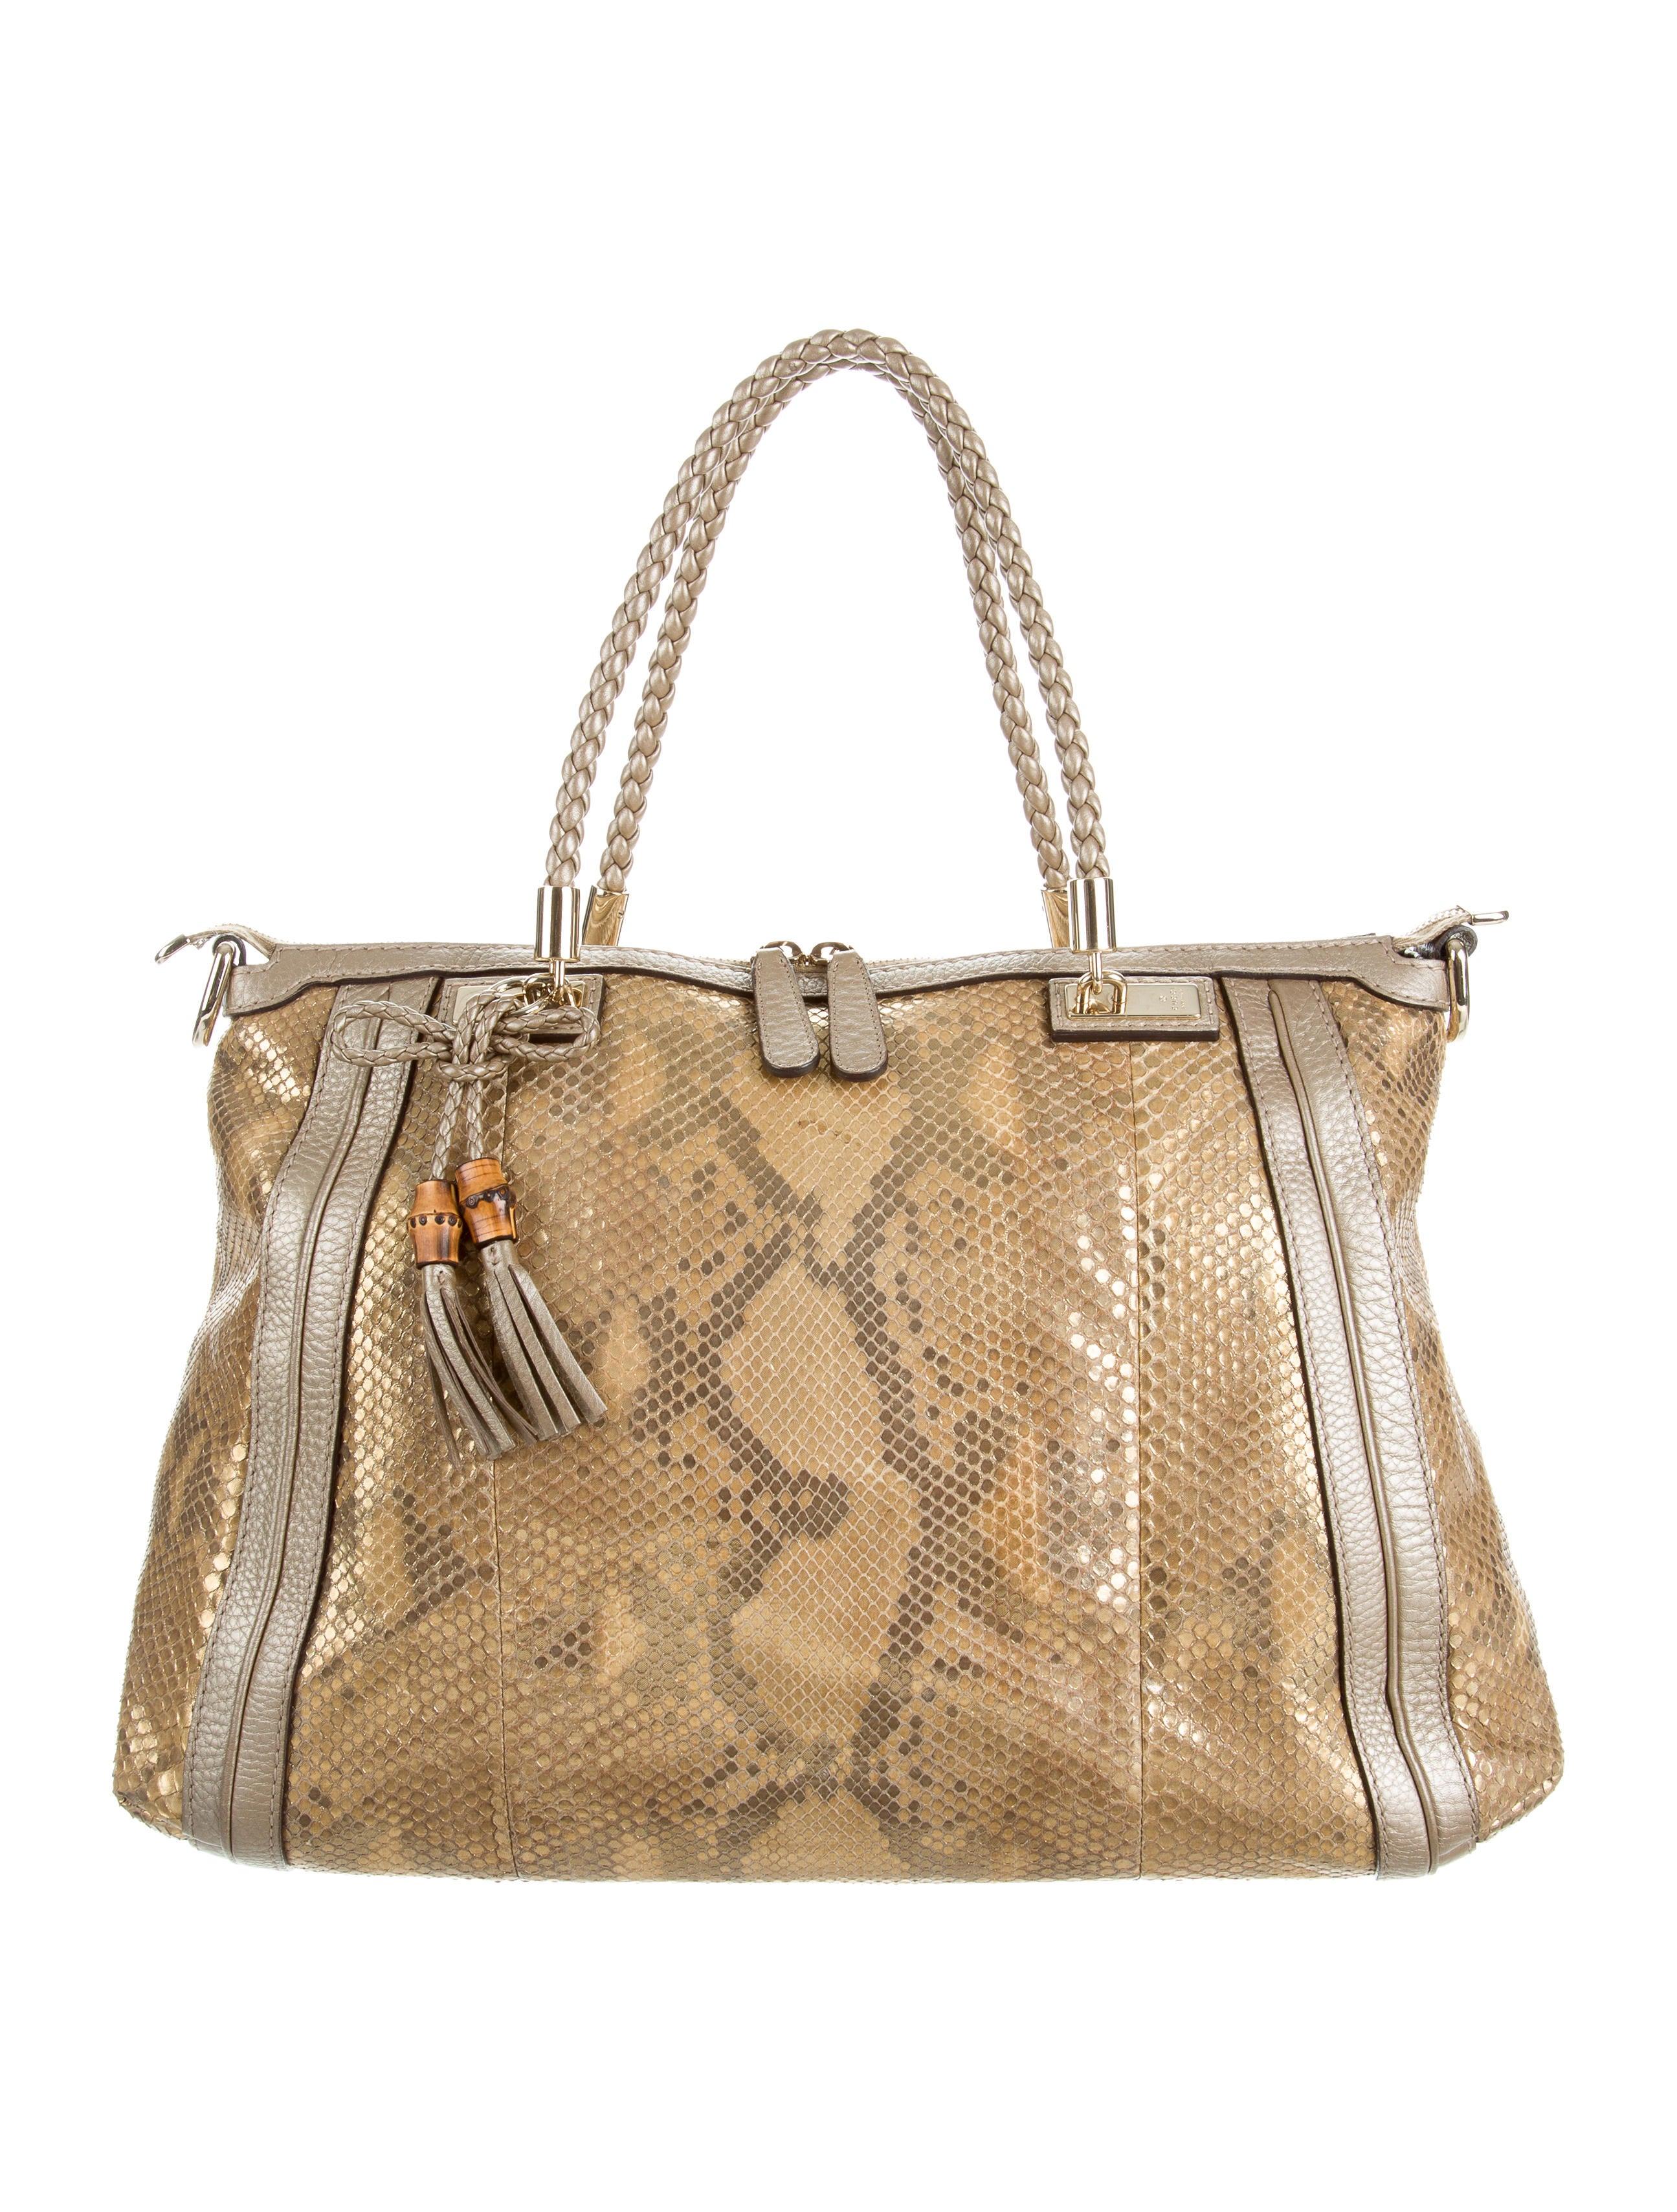 ab2995aaec4 Gucci Python Bella Top Handle Bag - Handbags - GUC150840